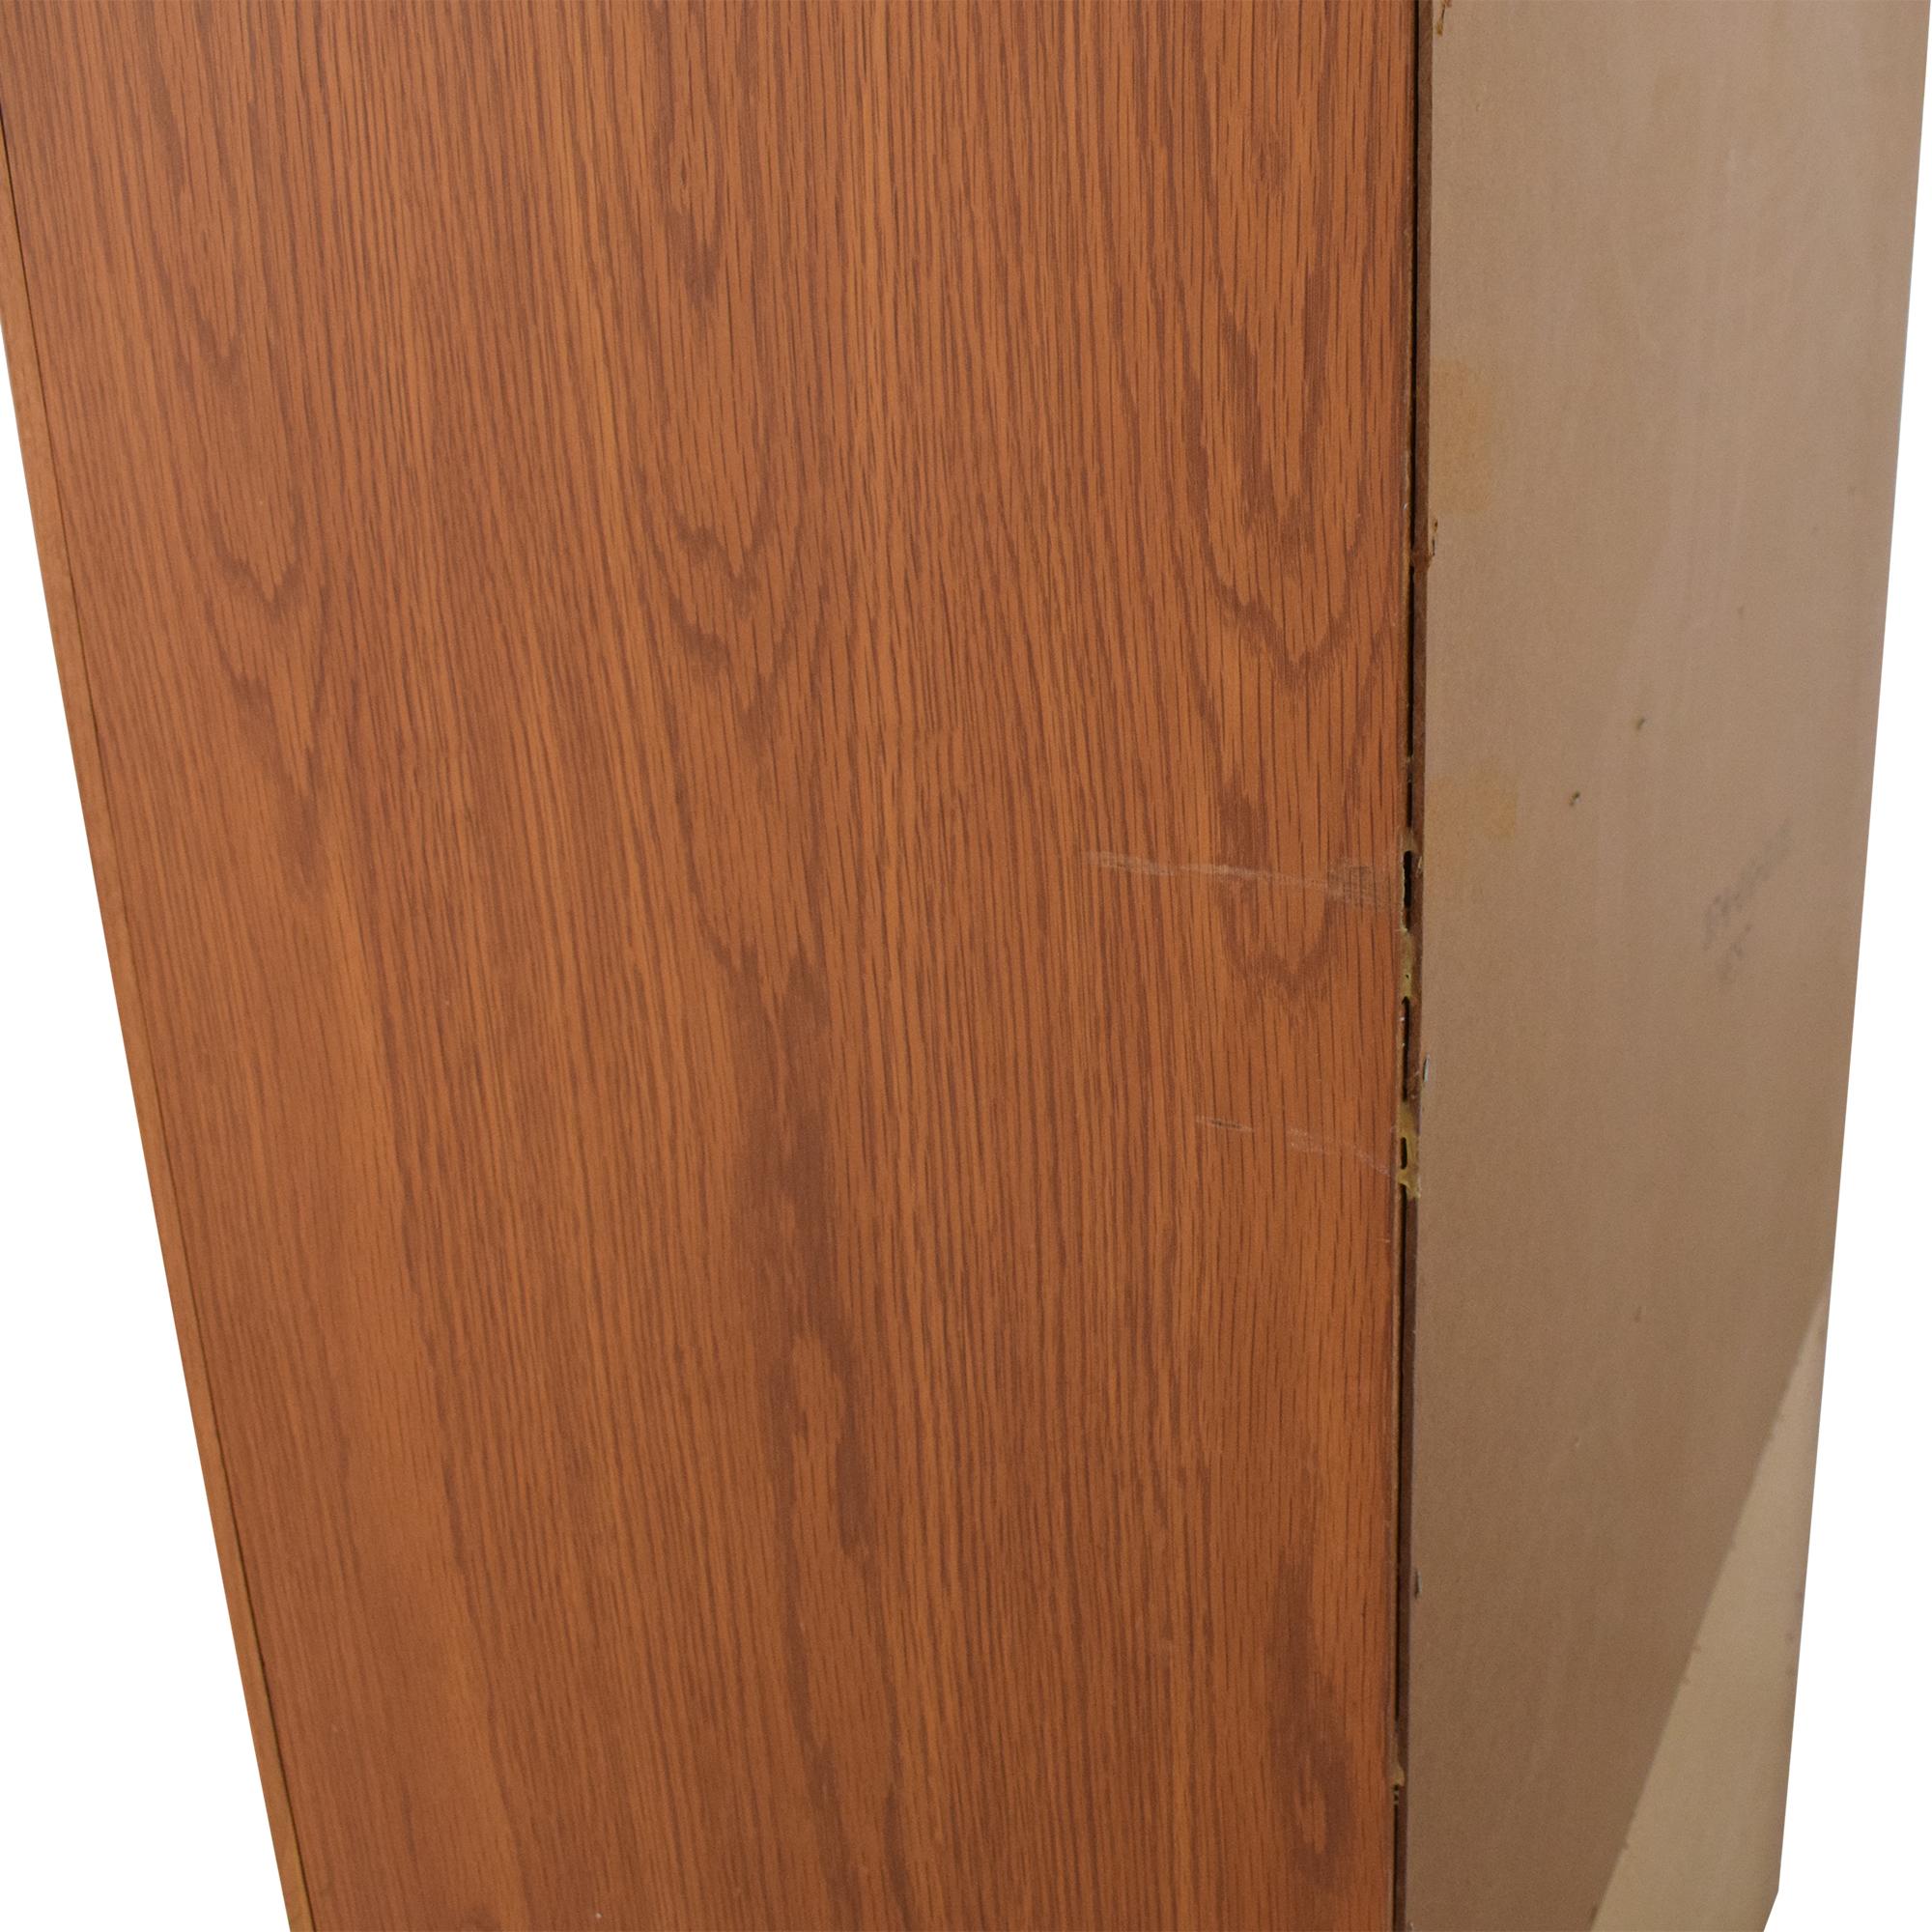 Vaughan Furniture Vaughan Bedroom Armoire second hand